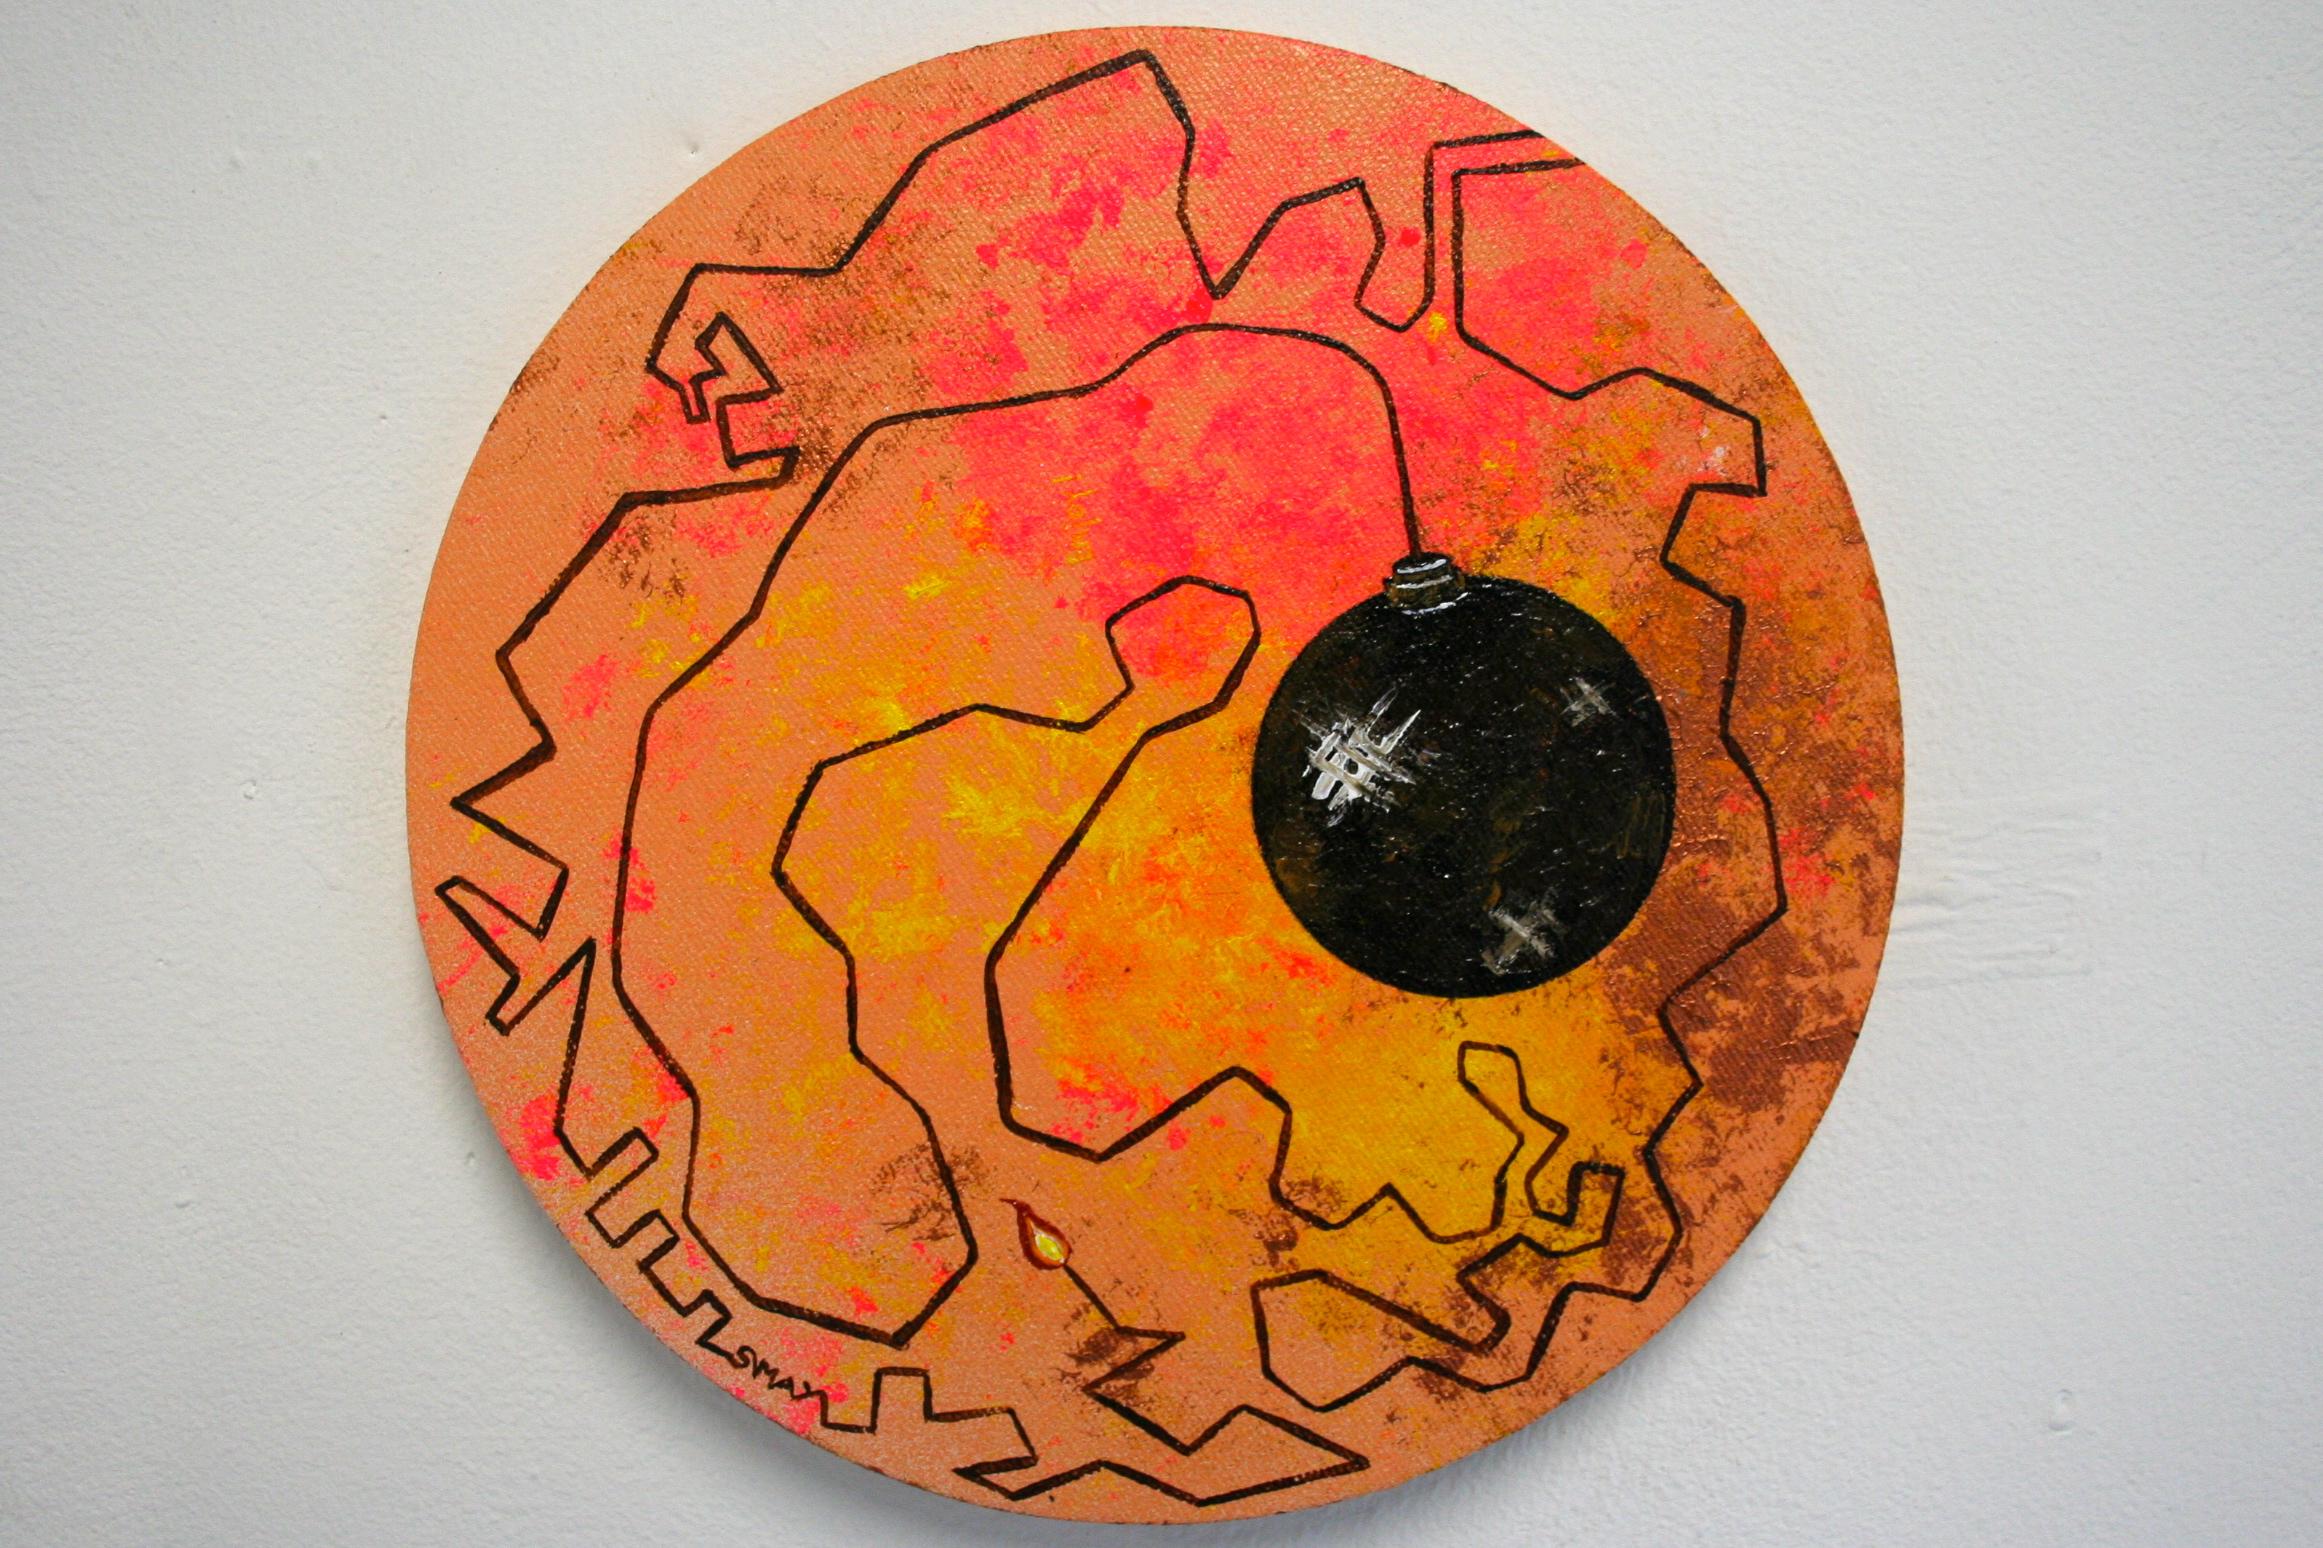 Enlighten me  2012 Acrylics on canvas 20cm diameter  More information